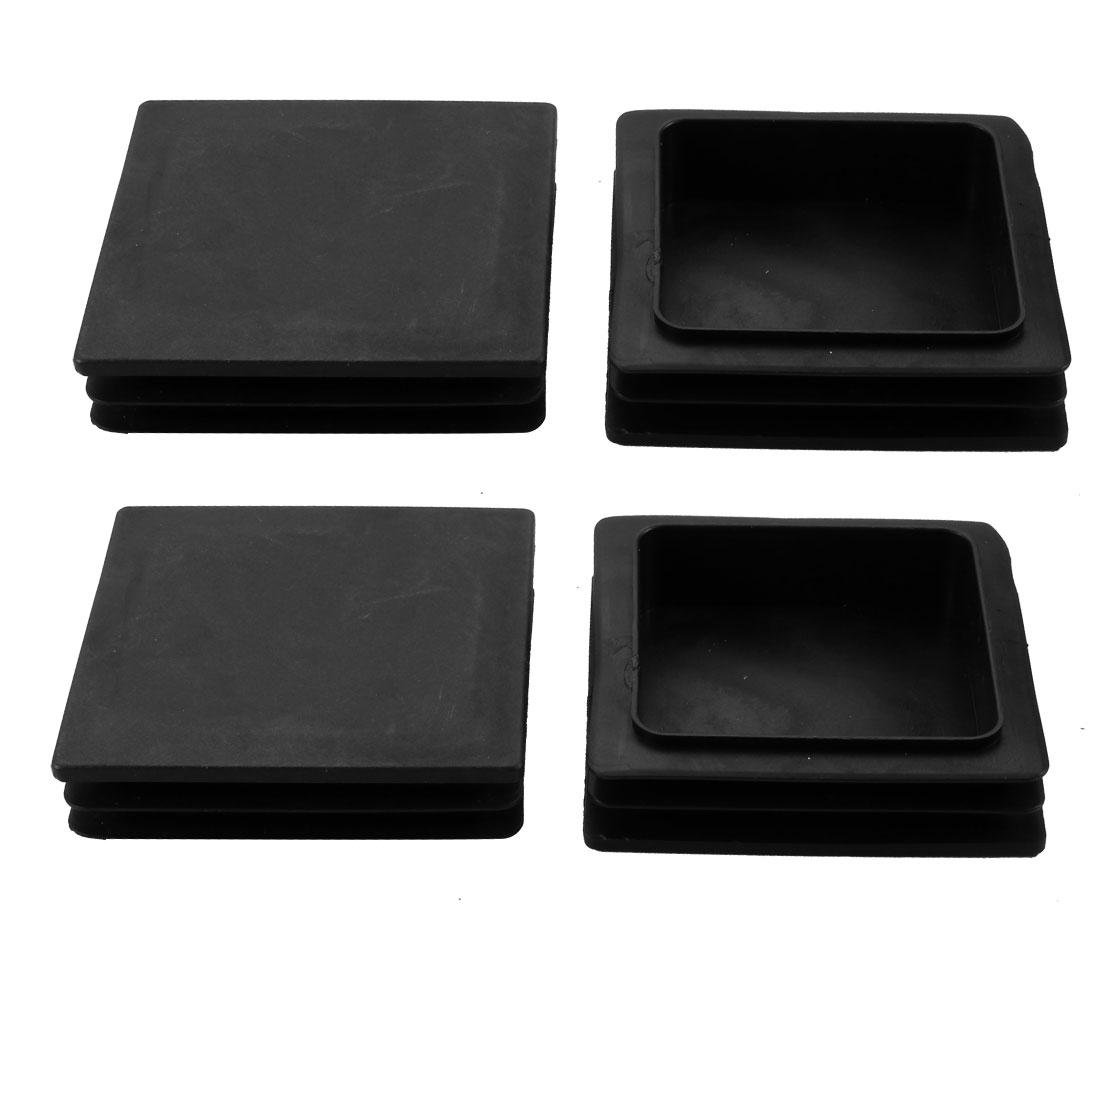 4pcs 100x100mm Black Plastic Square Cabinet Leg Insert Cover Protector